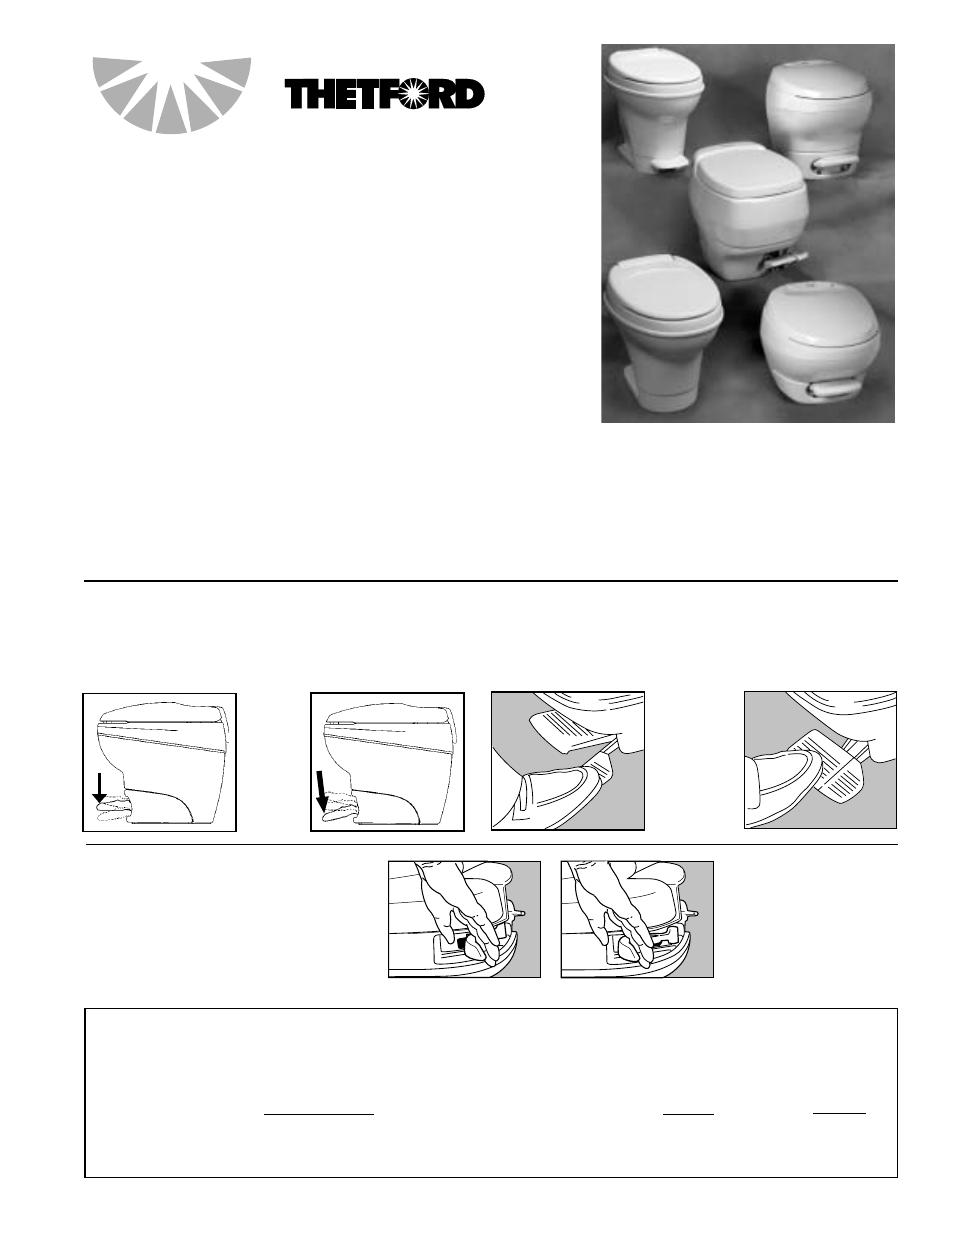 Thetford Aqua Magic Aurora User Manual 6 Pages Original Mode Toilet Parts Breakdown Together With Rv Diagram